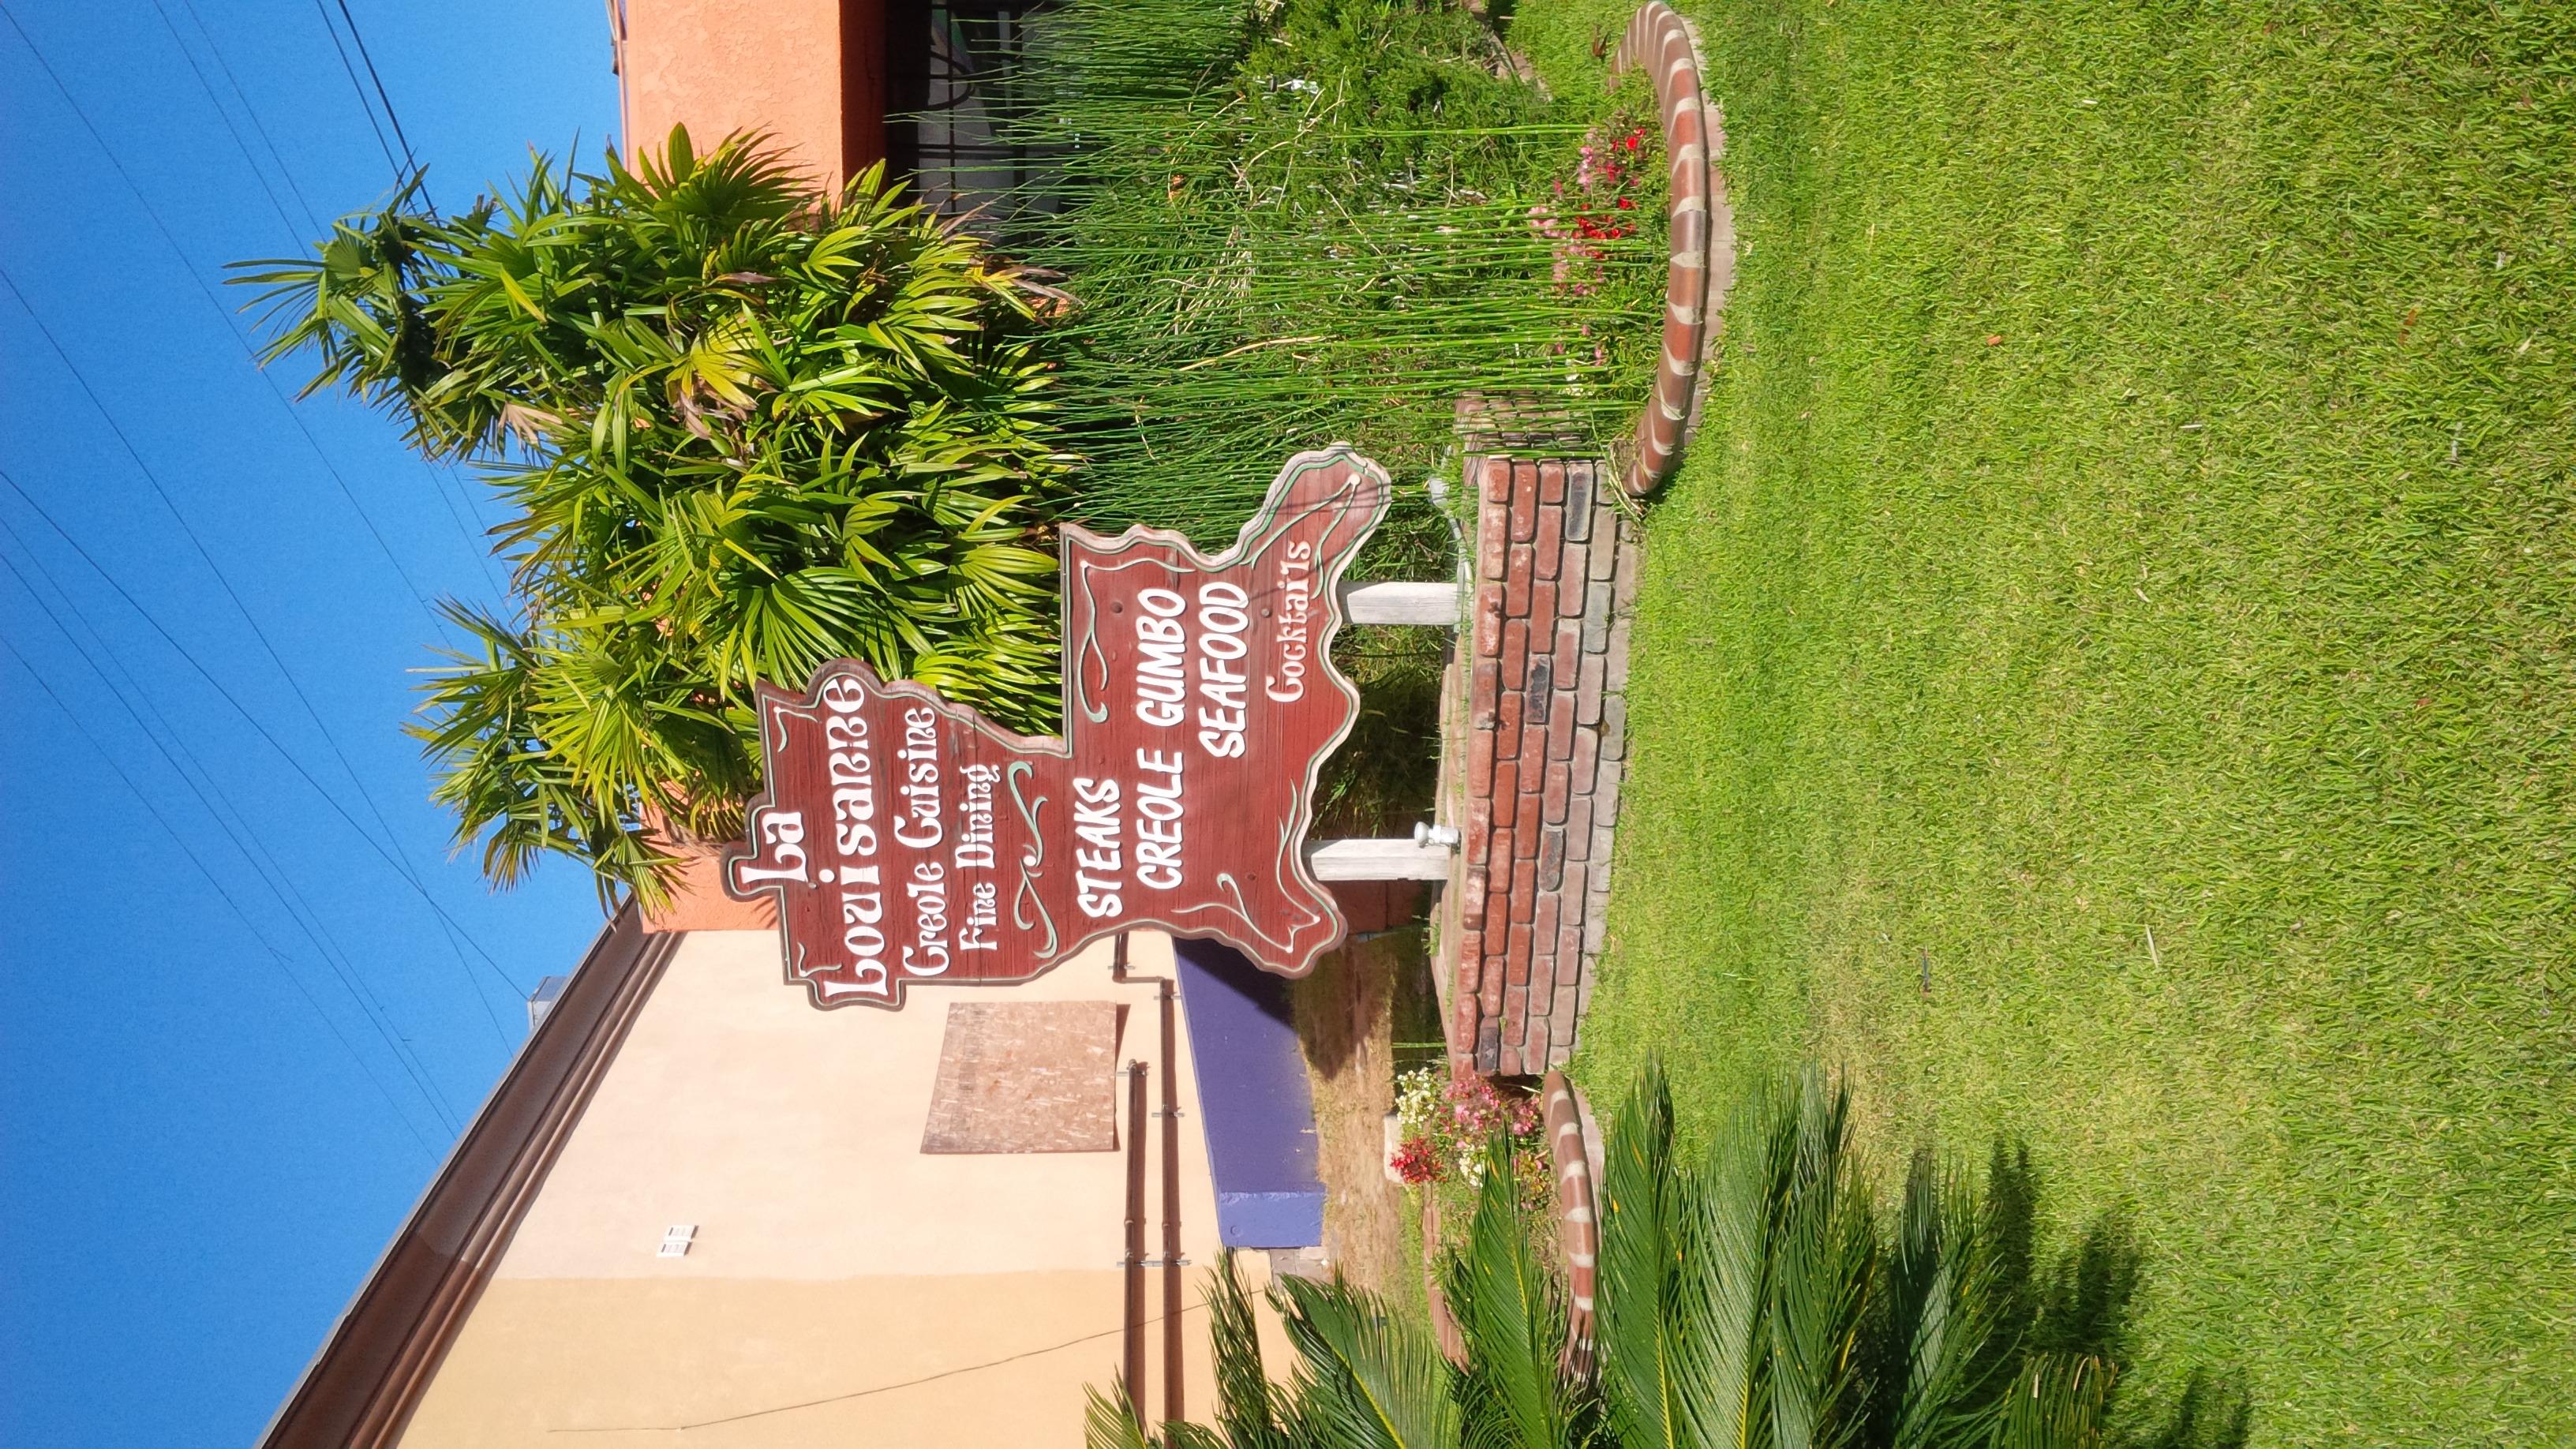 La Louisanne Creole Restaurant 5812 Overhill Dr Los Angeles CA 90043